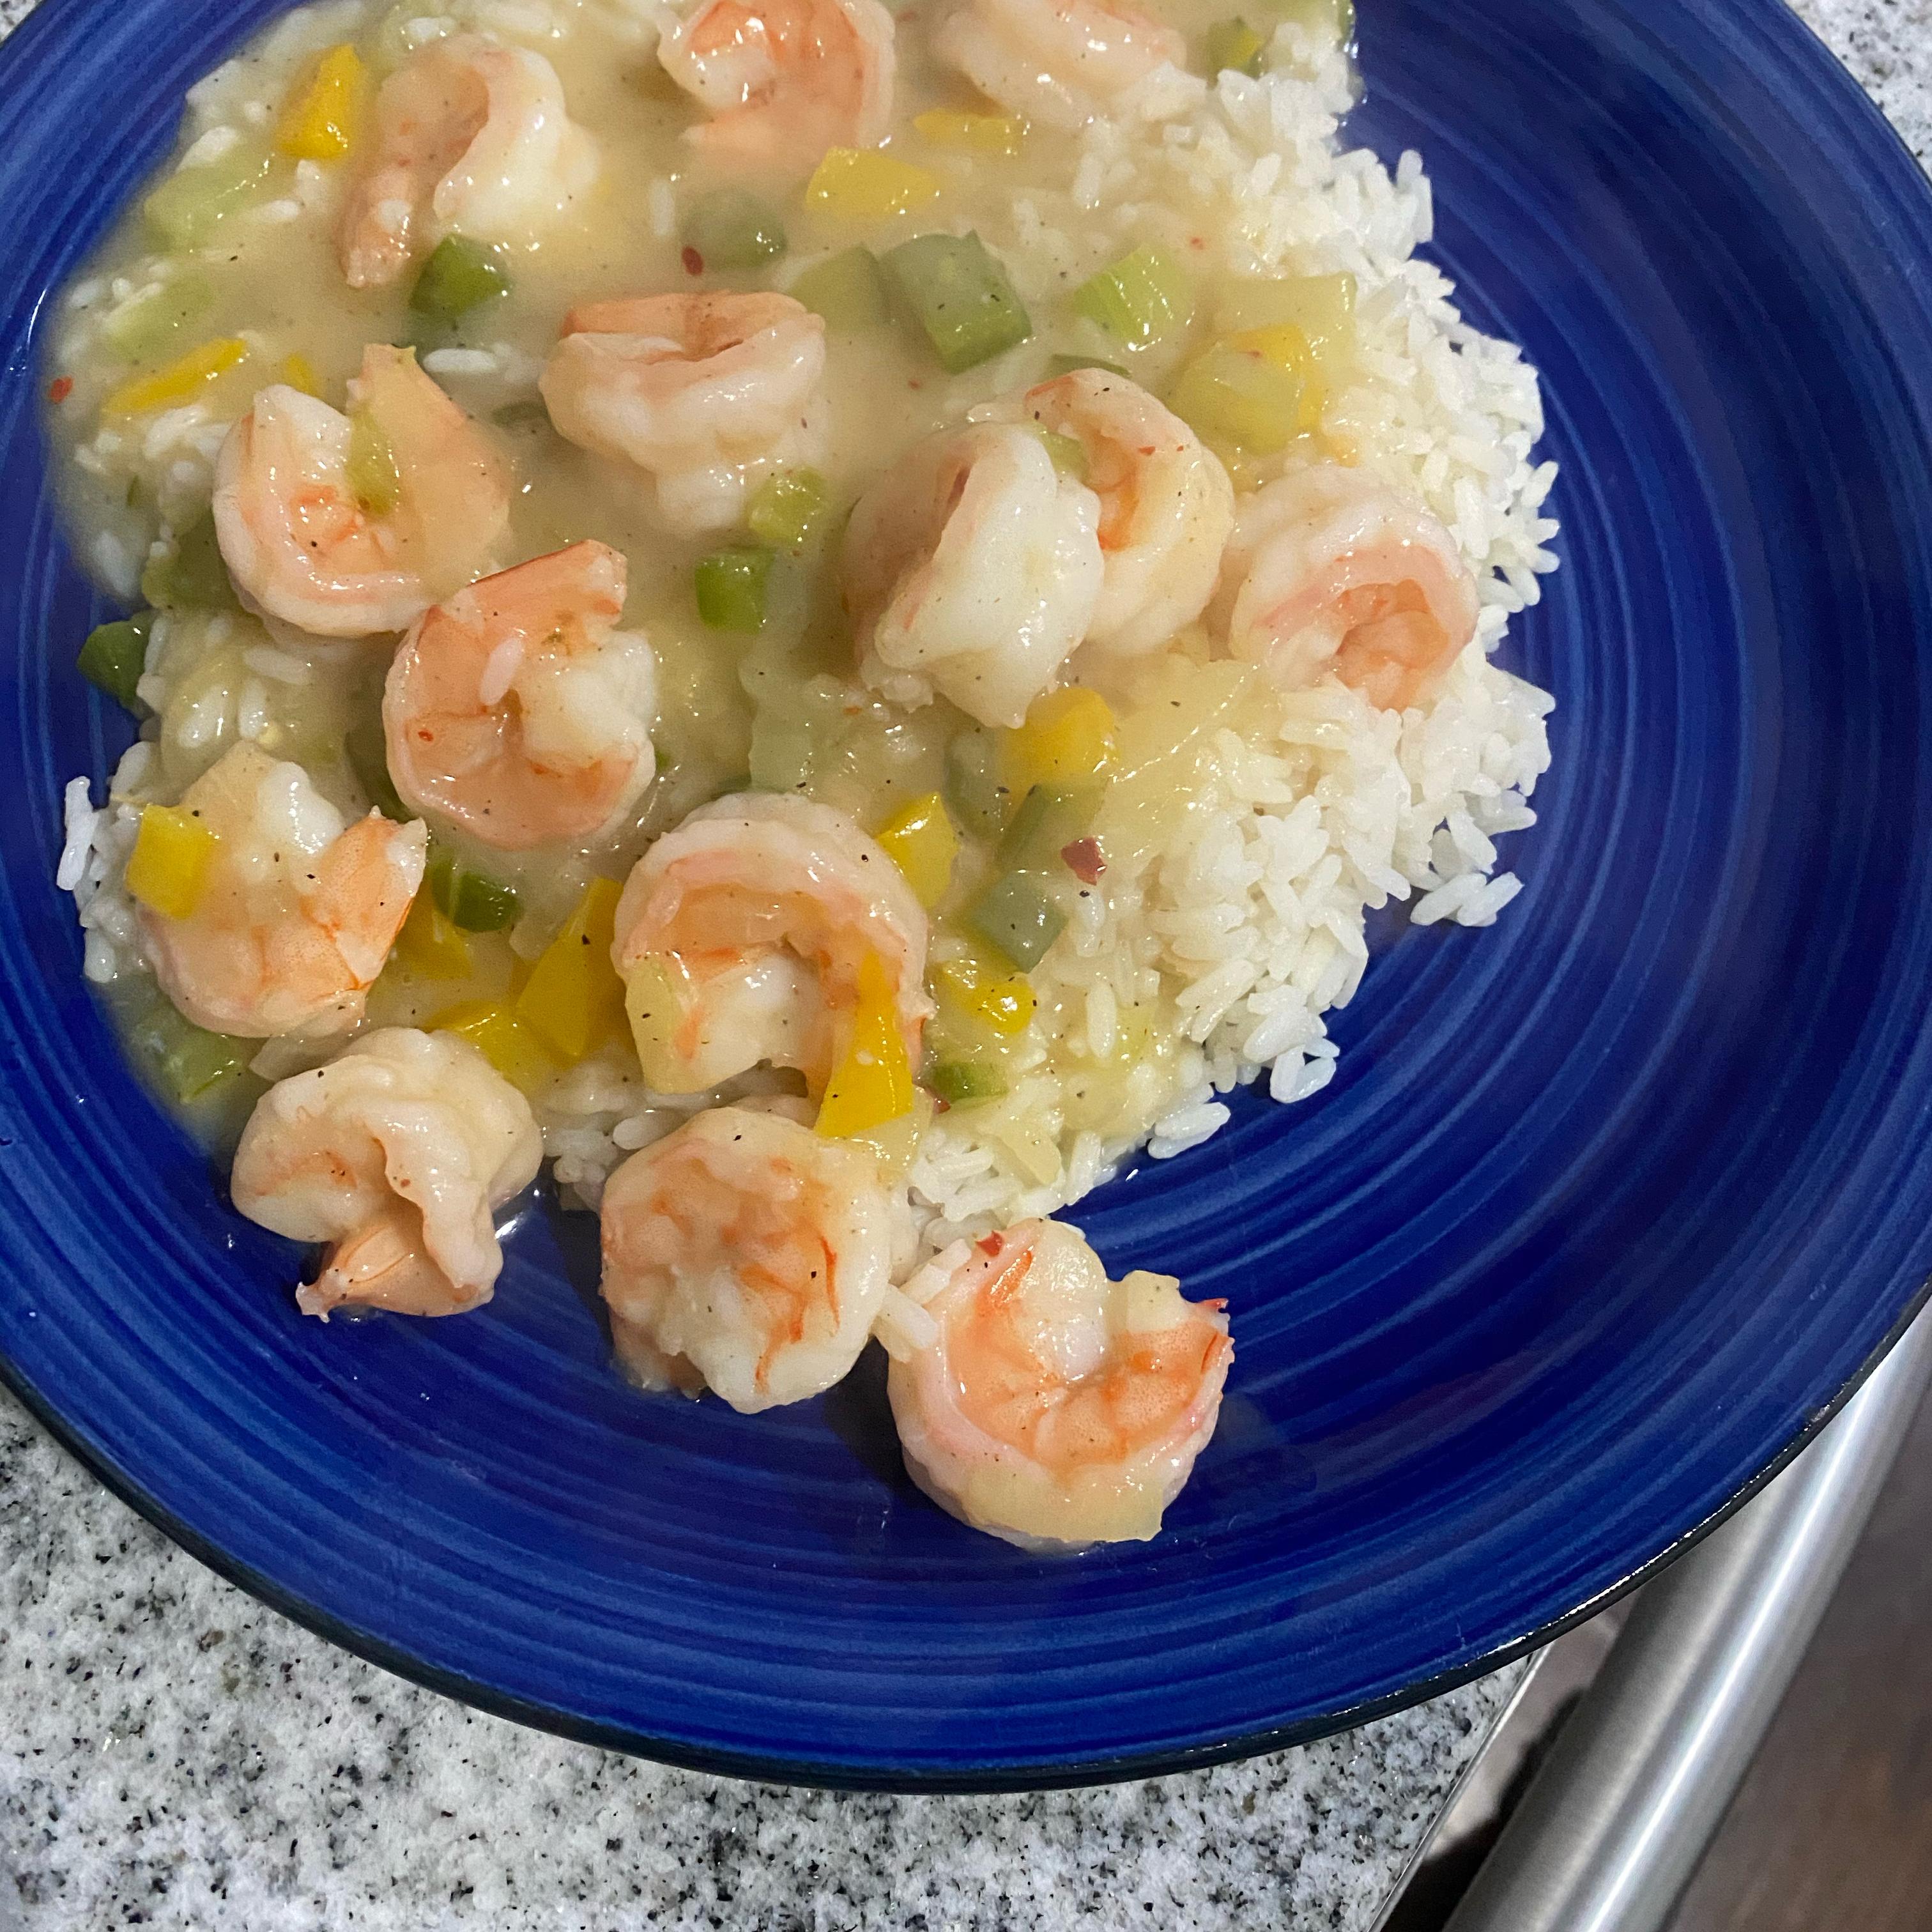 New Orleans Shrimp Ashley C